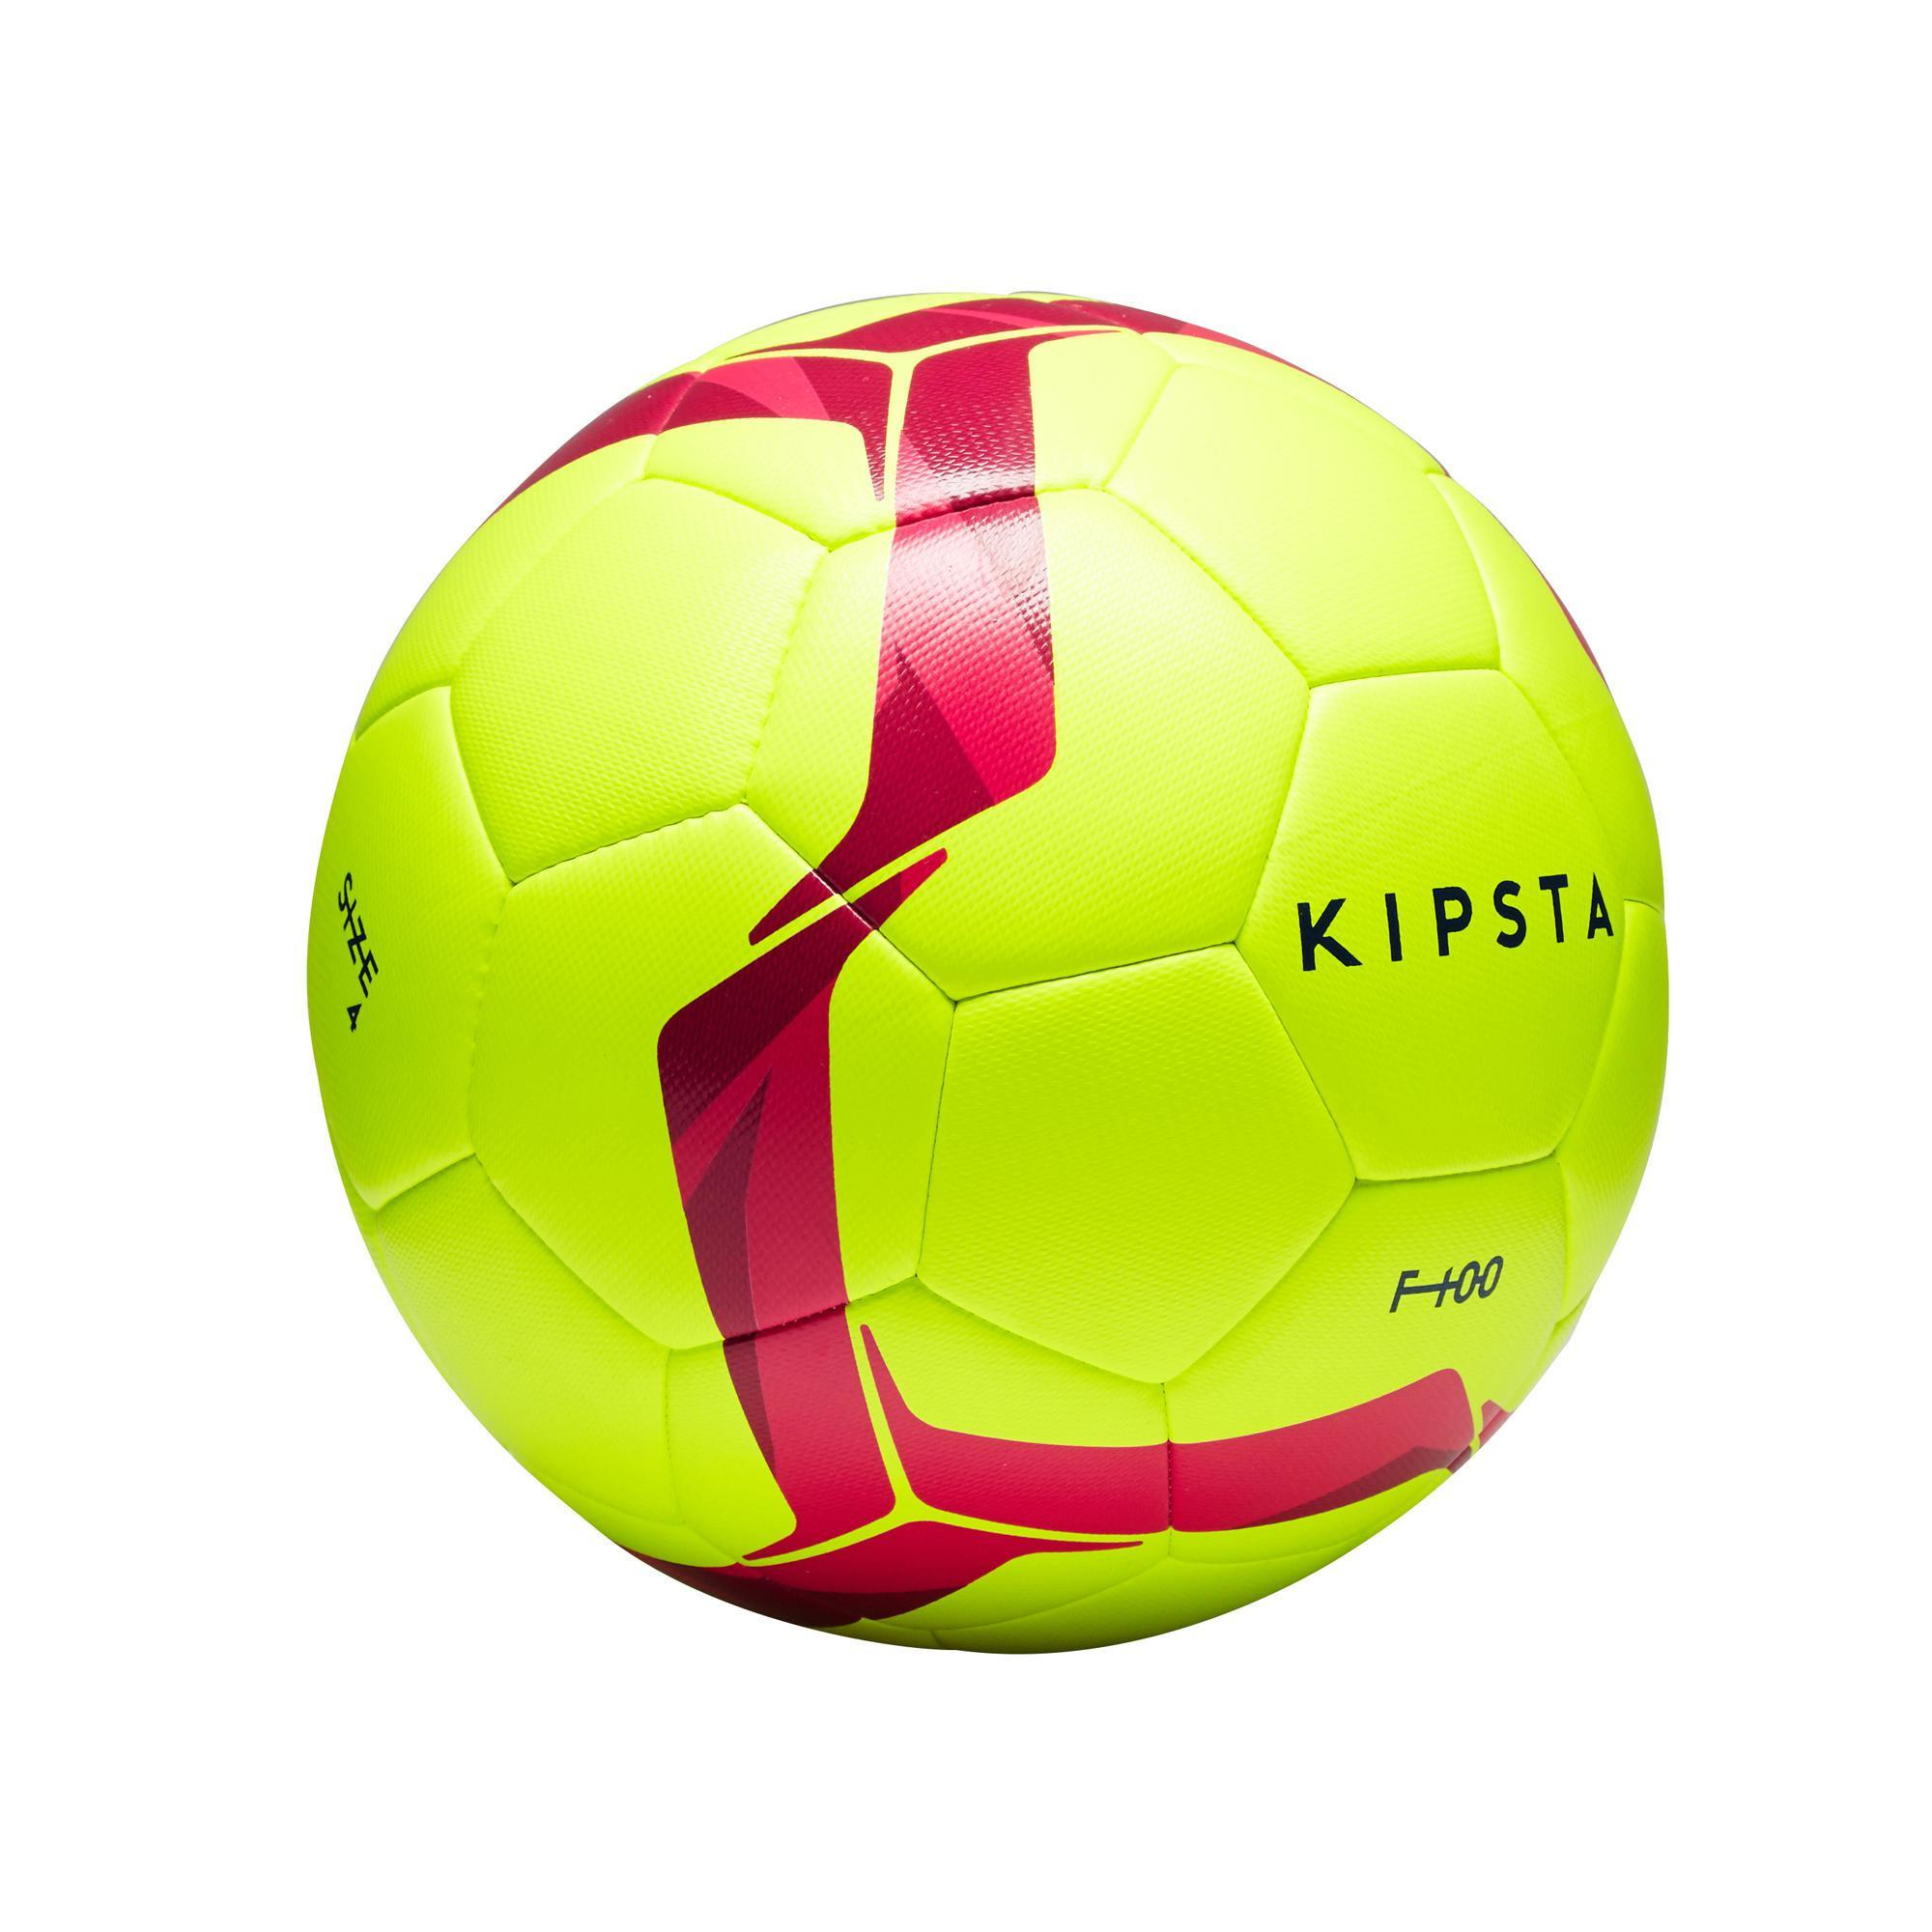 Ballons De Football Poids Et Tailles Officiels Decathlon